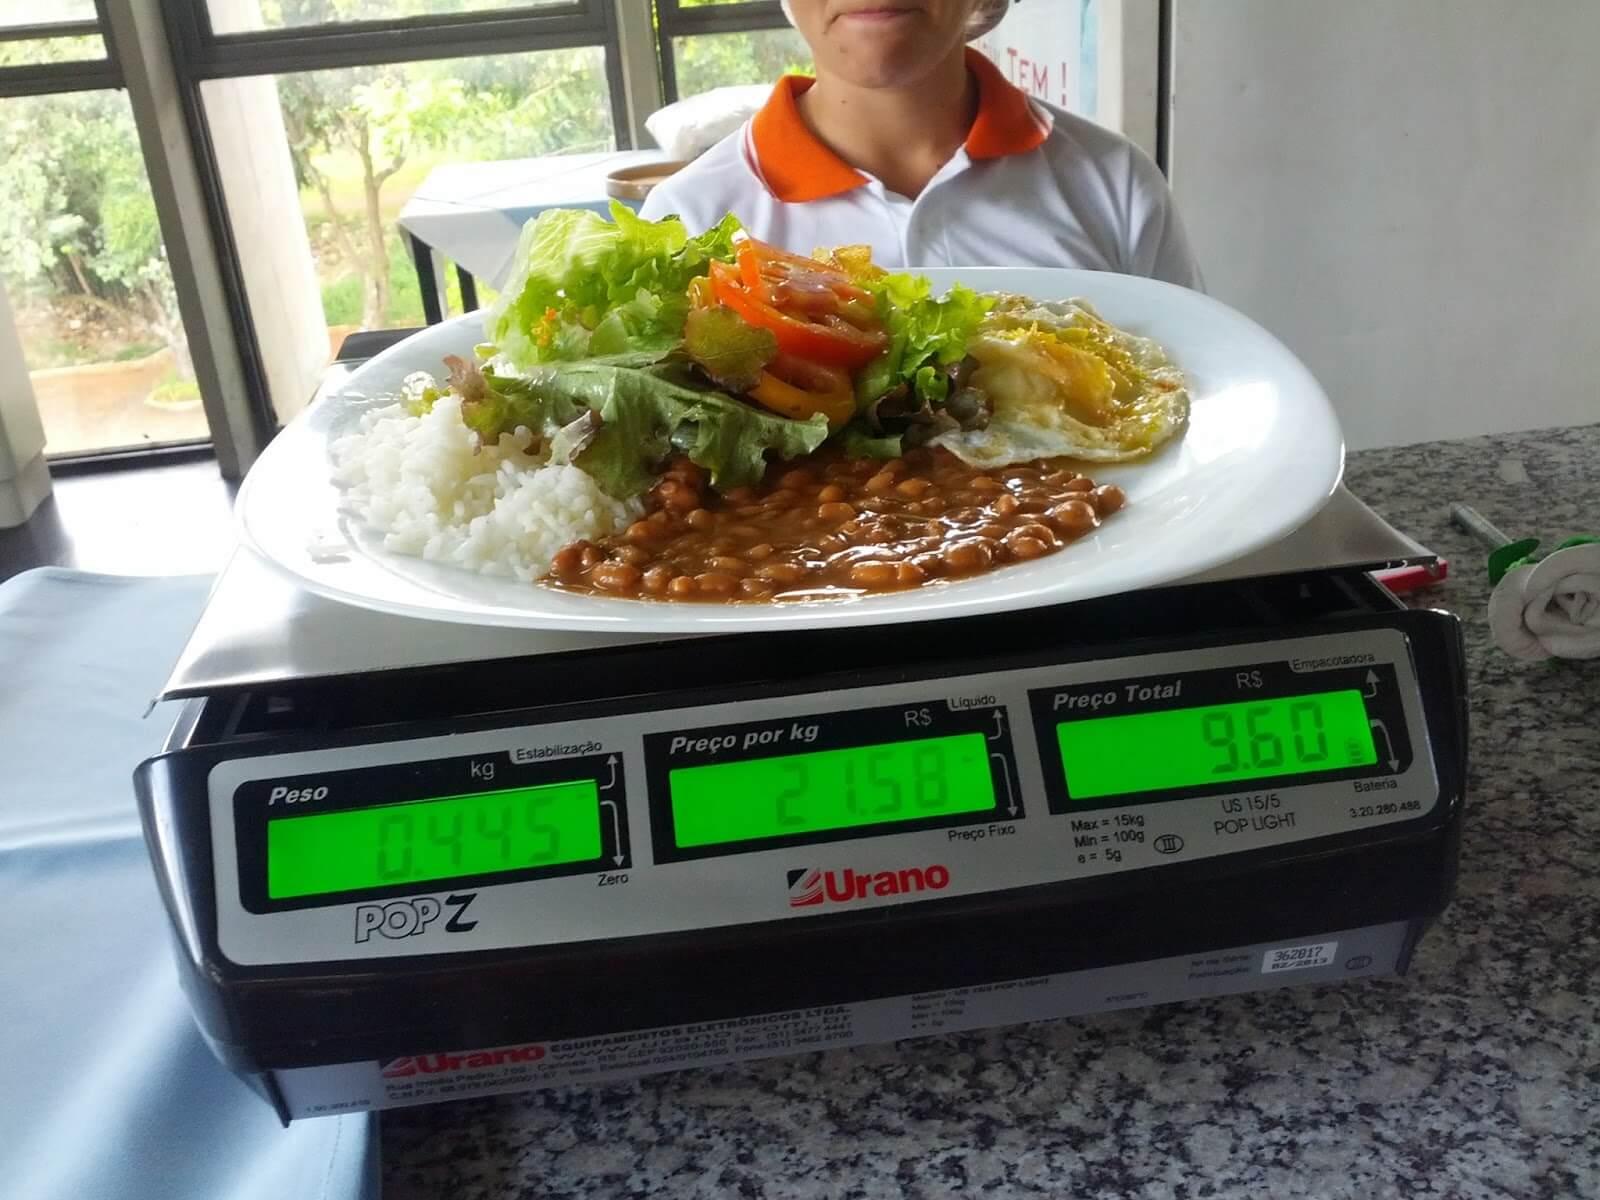 equipamentos e hardwares de automacao comercial para estabelecimentos como balanca comercial para restaurantes